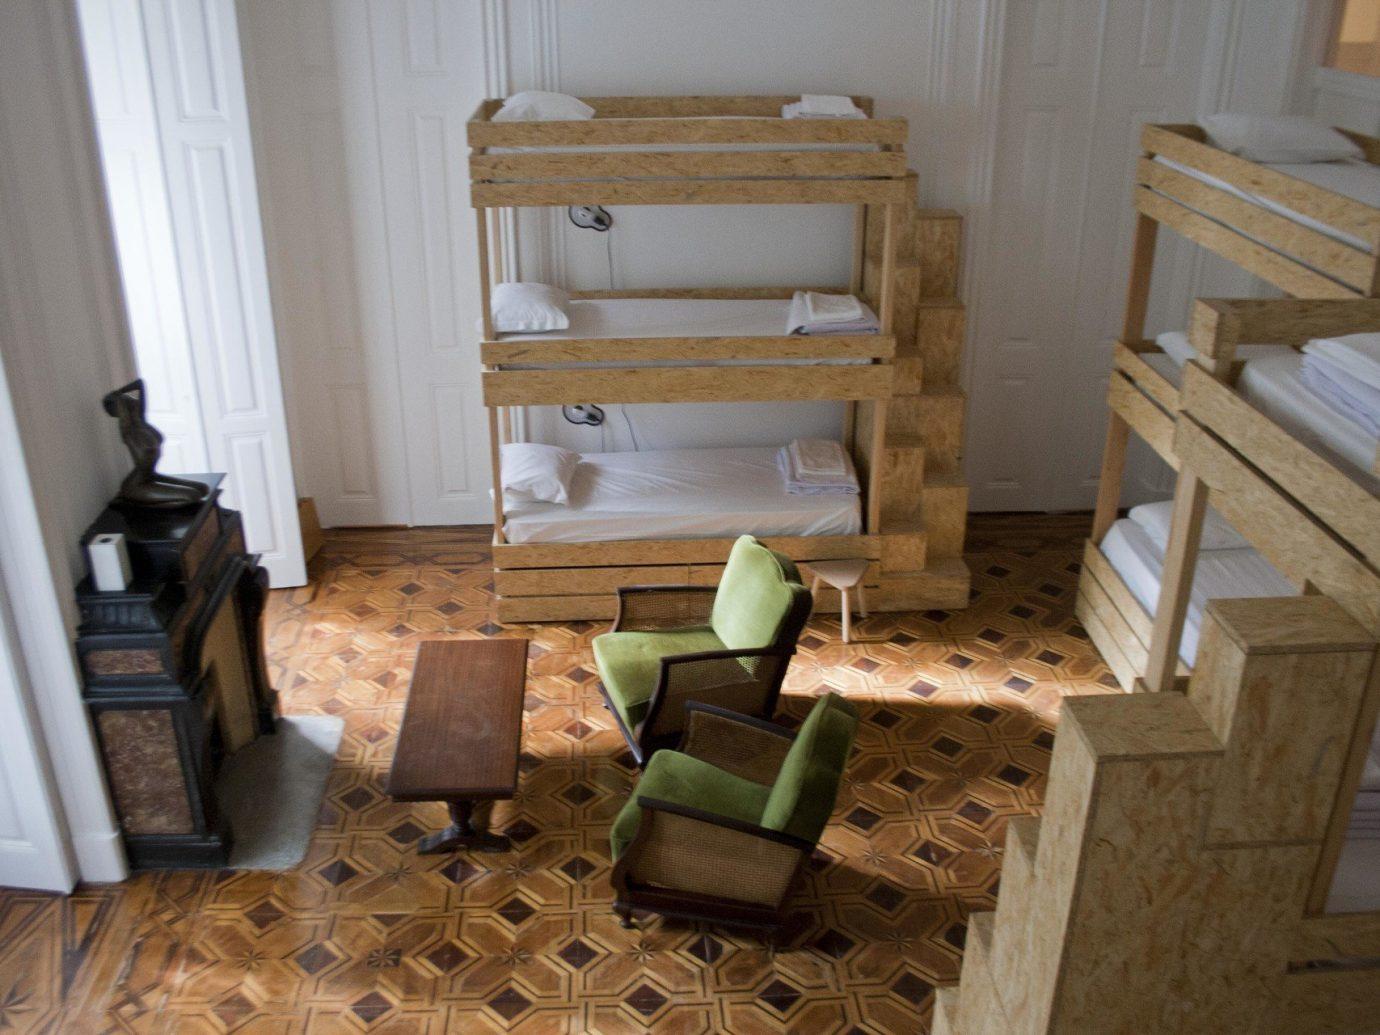 bed Bedroom bunk beds homey Hotels natural light Rustic floor indoor room property furniture home wood living room cottage stairs flooring